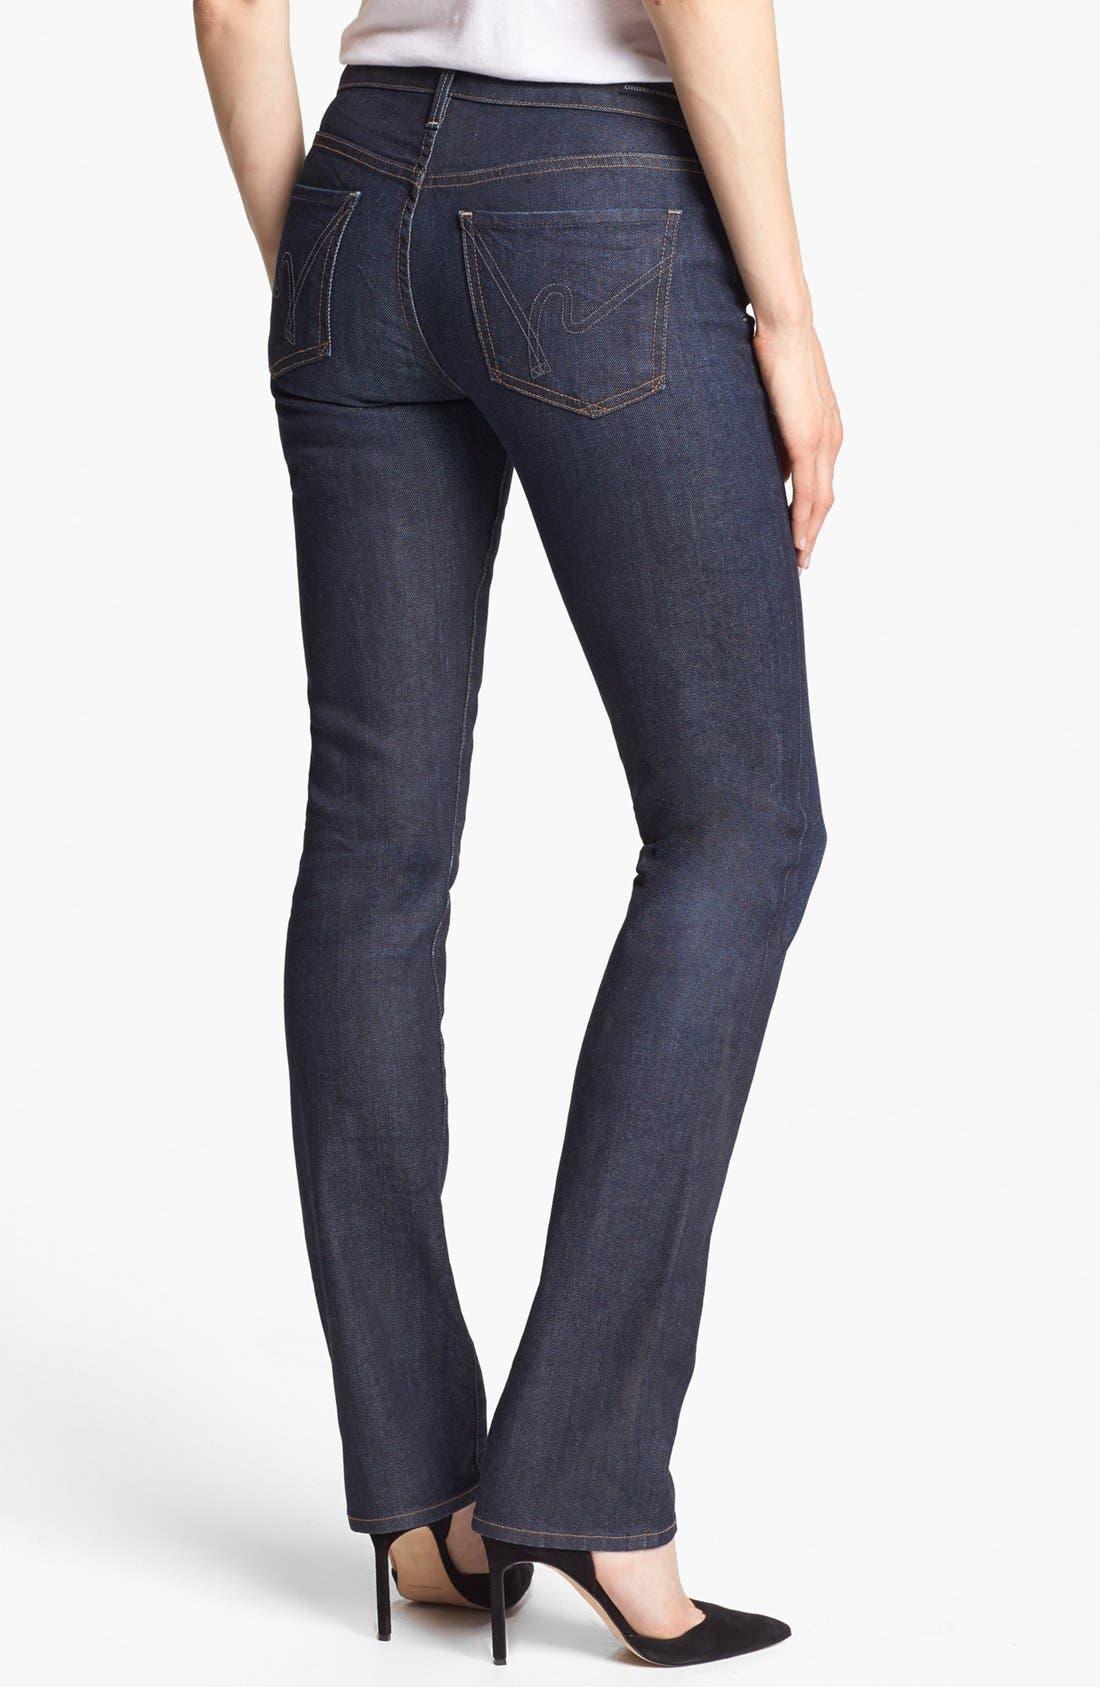 Alternate Image 2  - Citizens of Humanity 'Ava' Straight Leg Jeans (Hush)